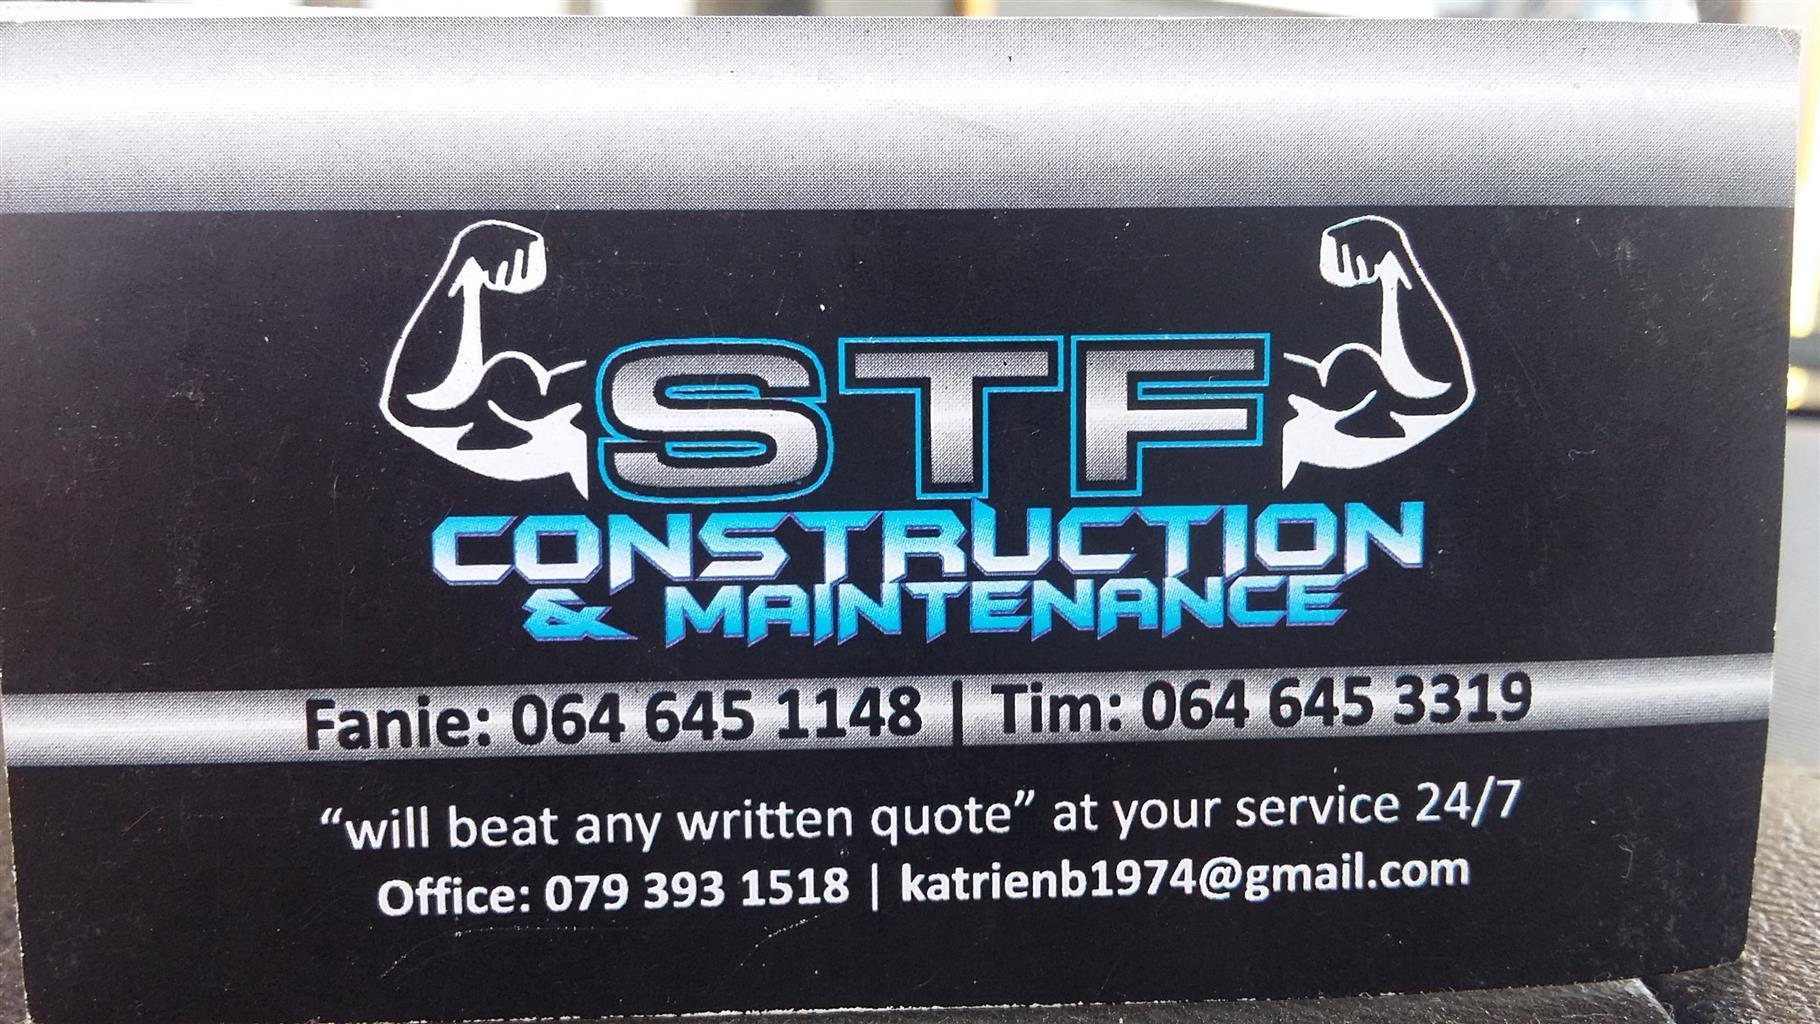 SFT CONSTRUCTION & MAINTENANCE